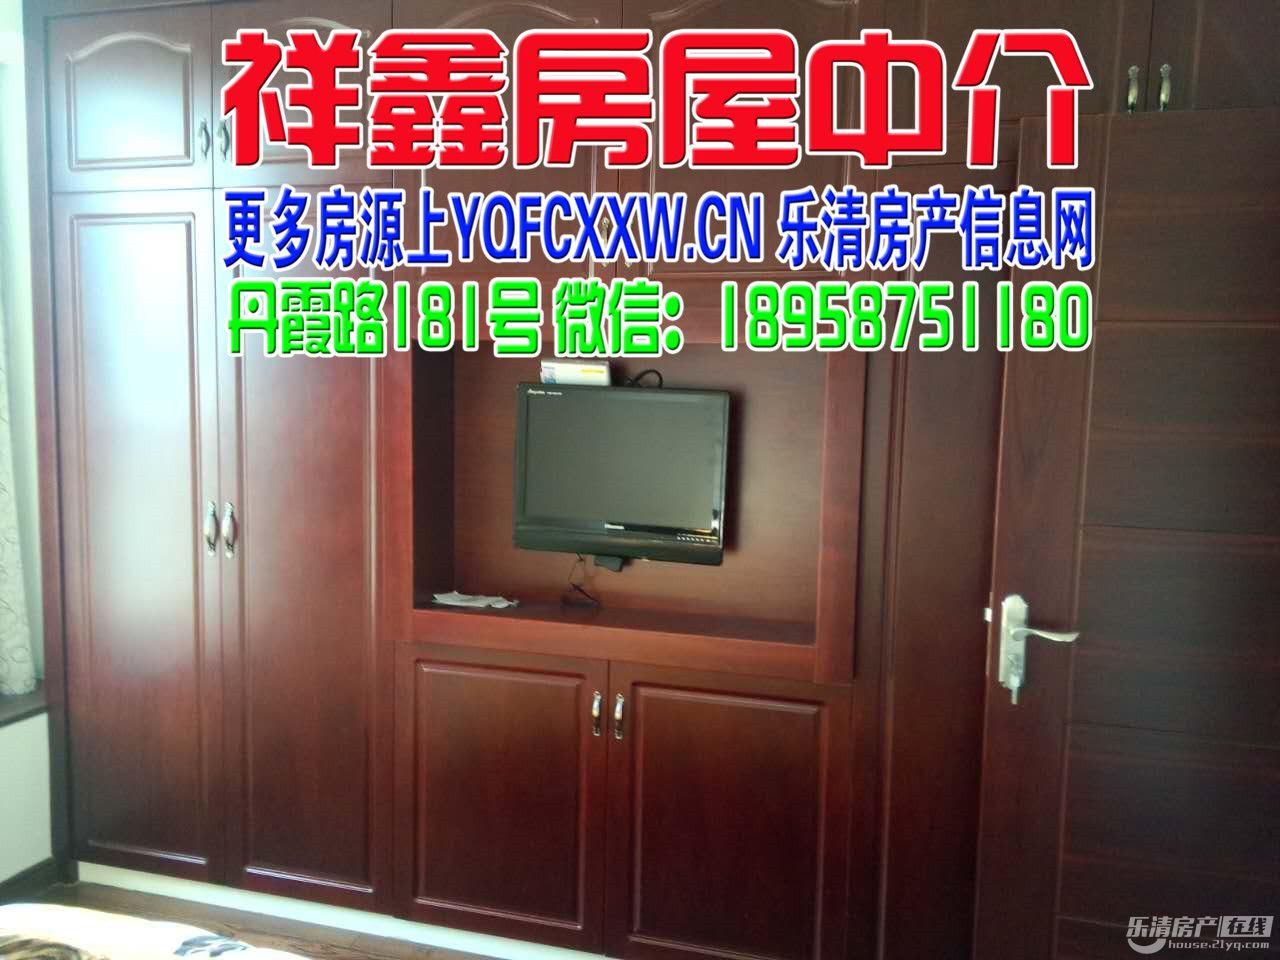 http://house.21yq.com/userfiles/image/20160630/3014115296801eeba23861.jpg